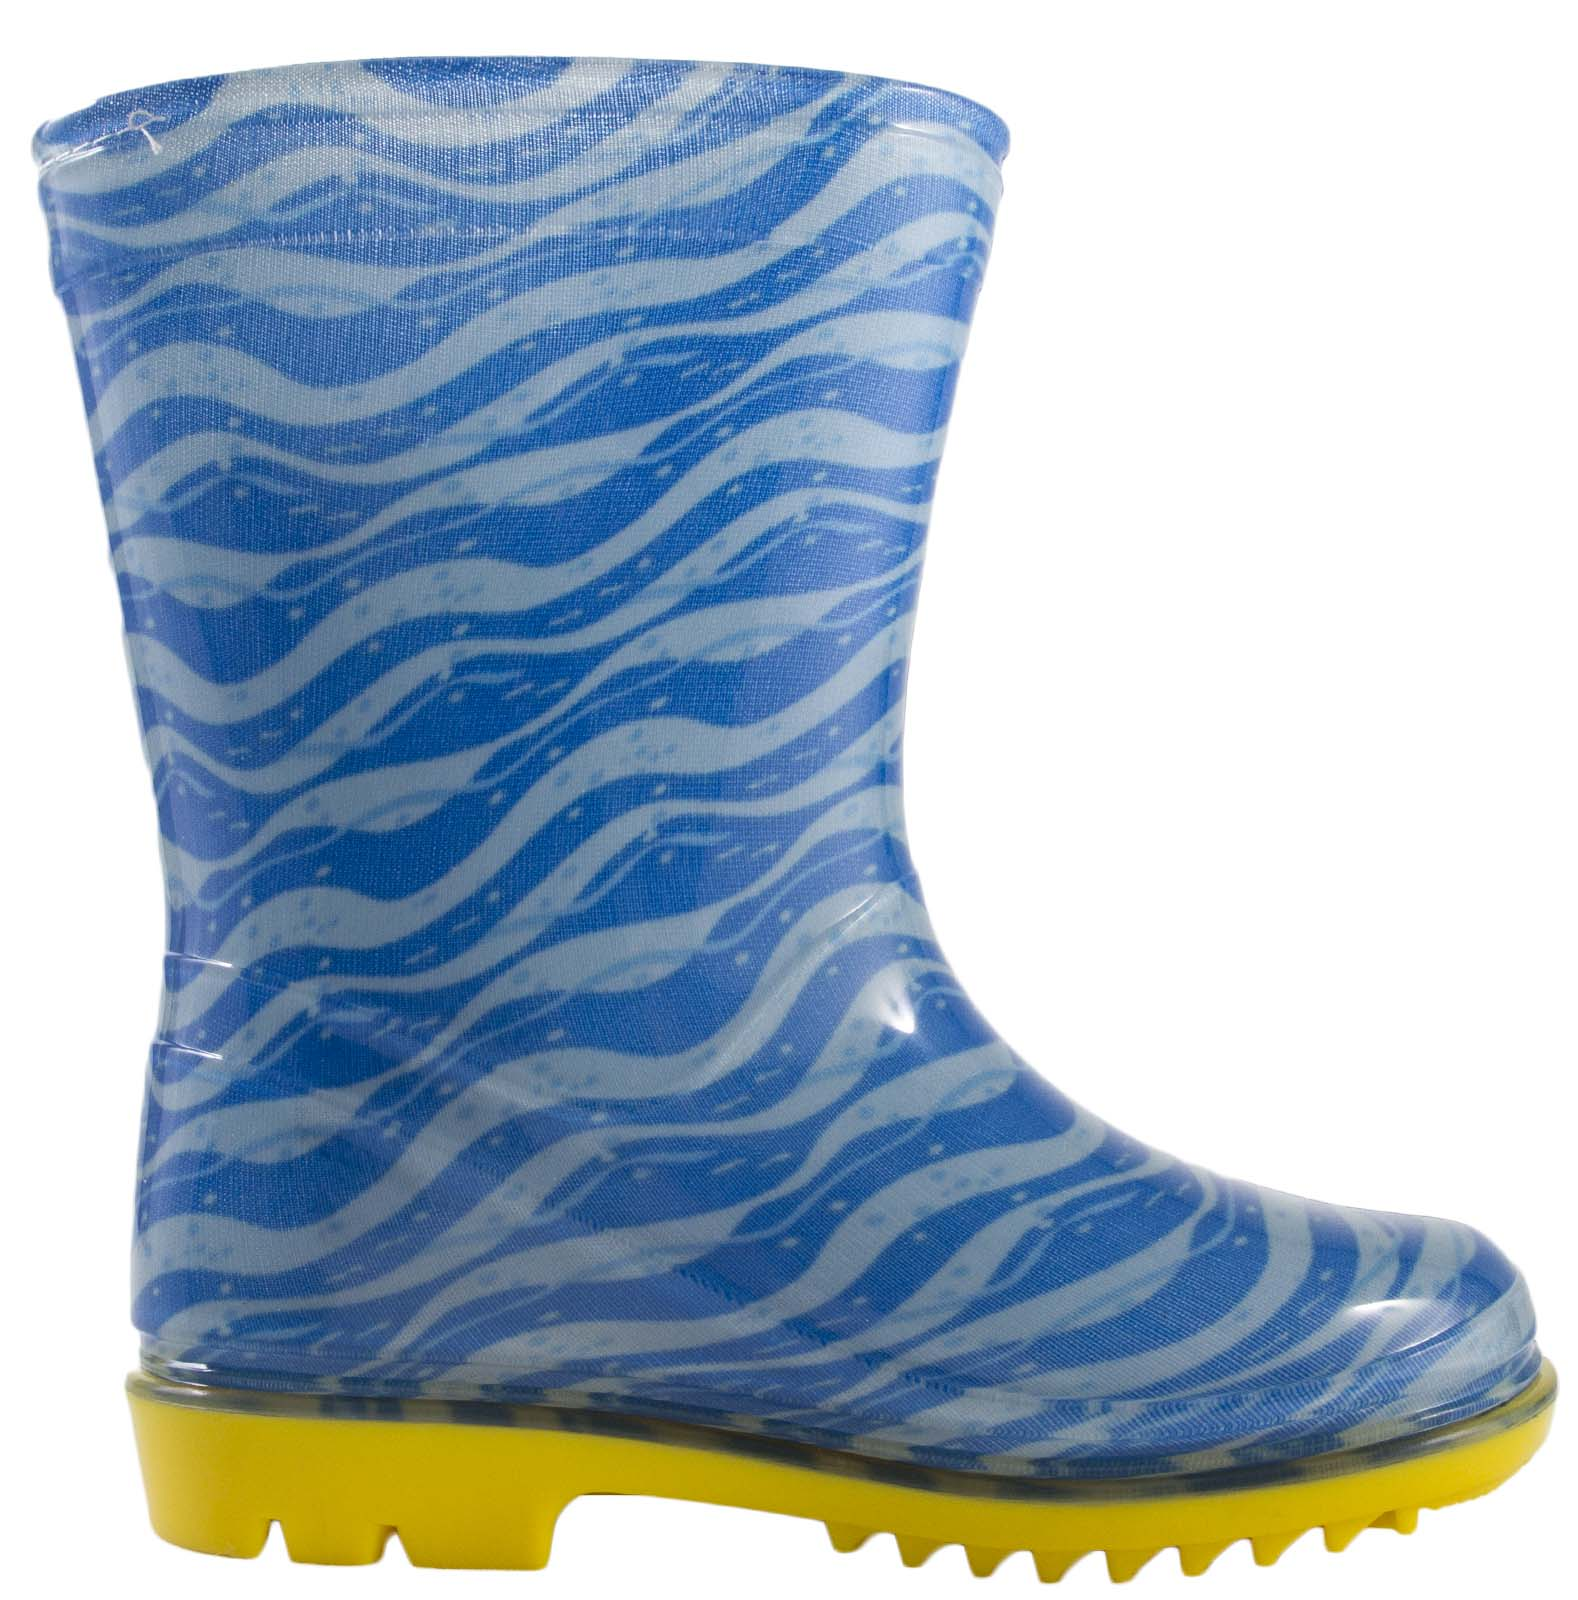 Disney Finding Dory Wellington Boots Rain Wellies Snow Boots Boys Girls Size